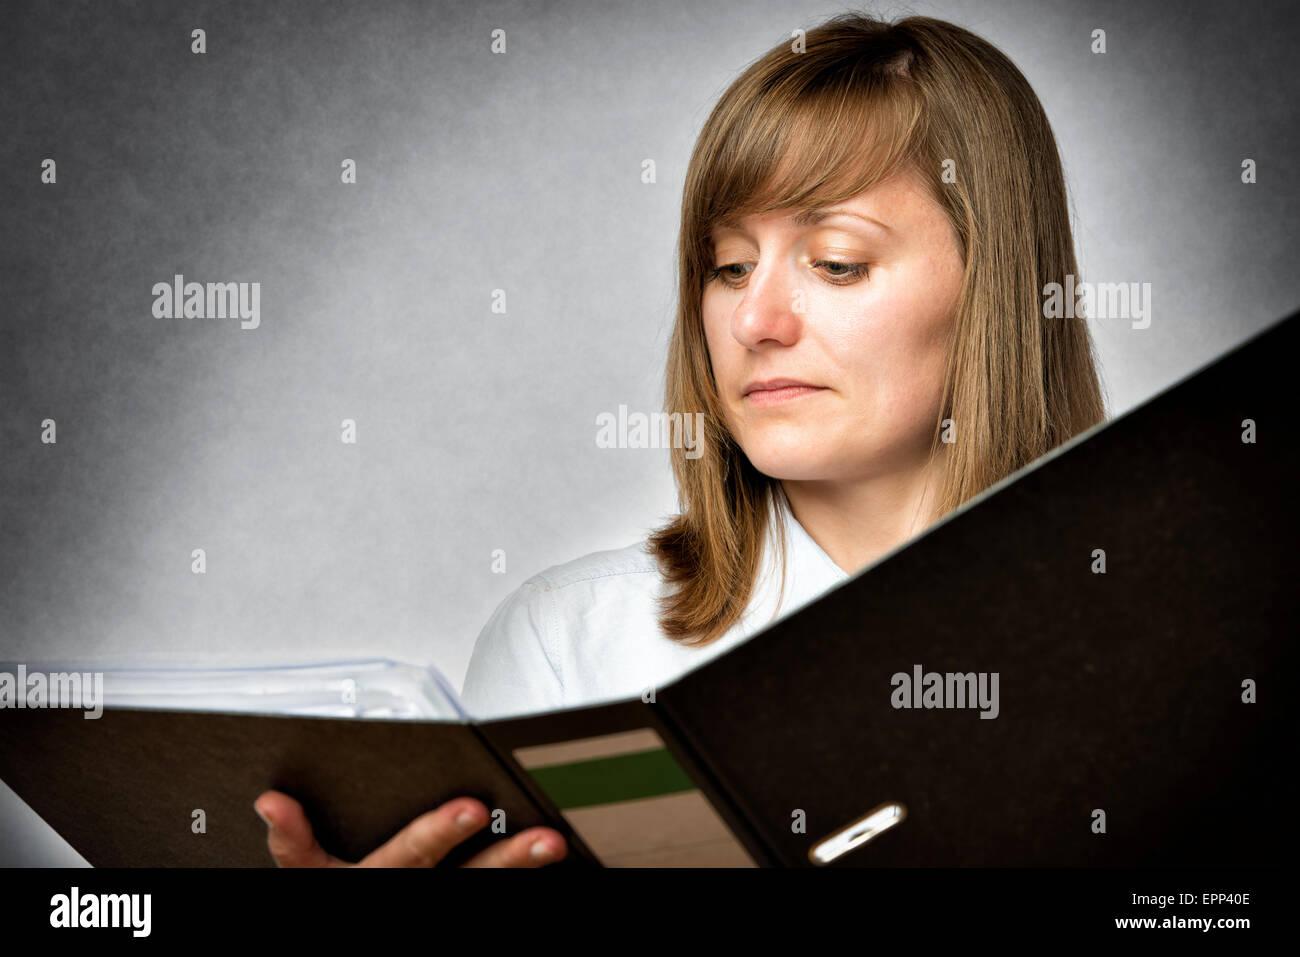 Female office worker is reading in a folder - Stock Image